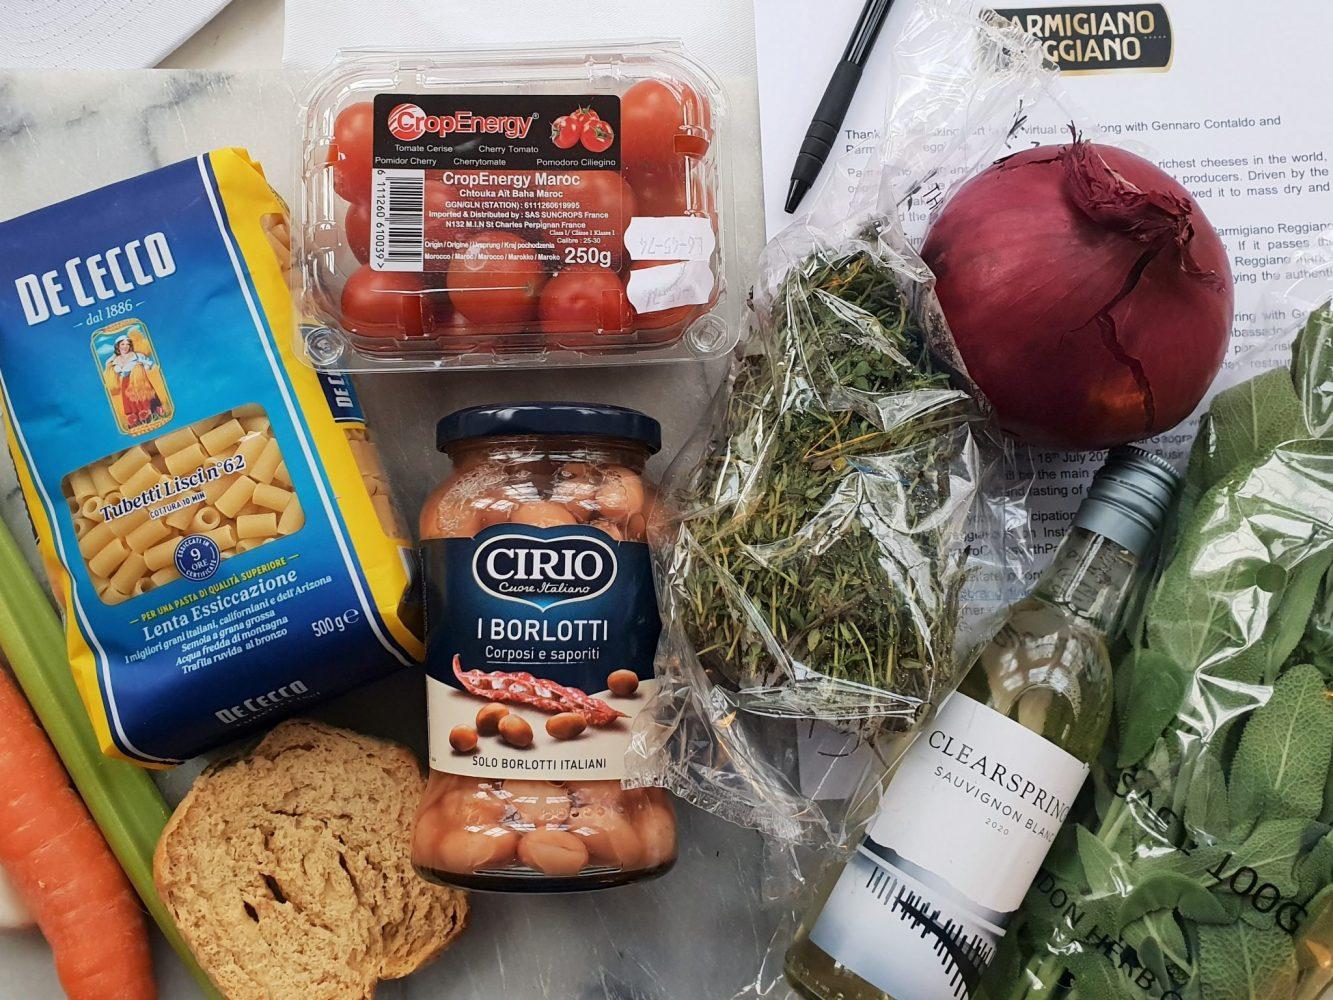 Parmigiano Reggiano ingredients